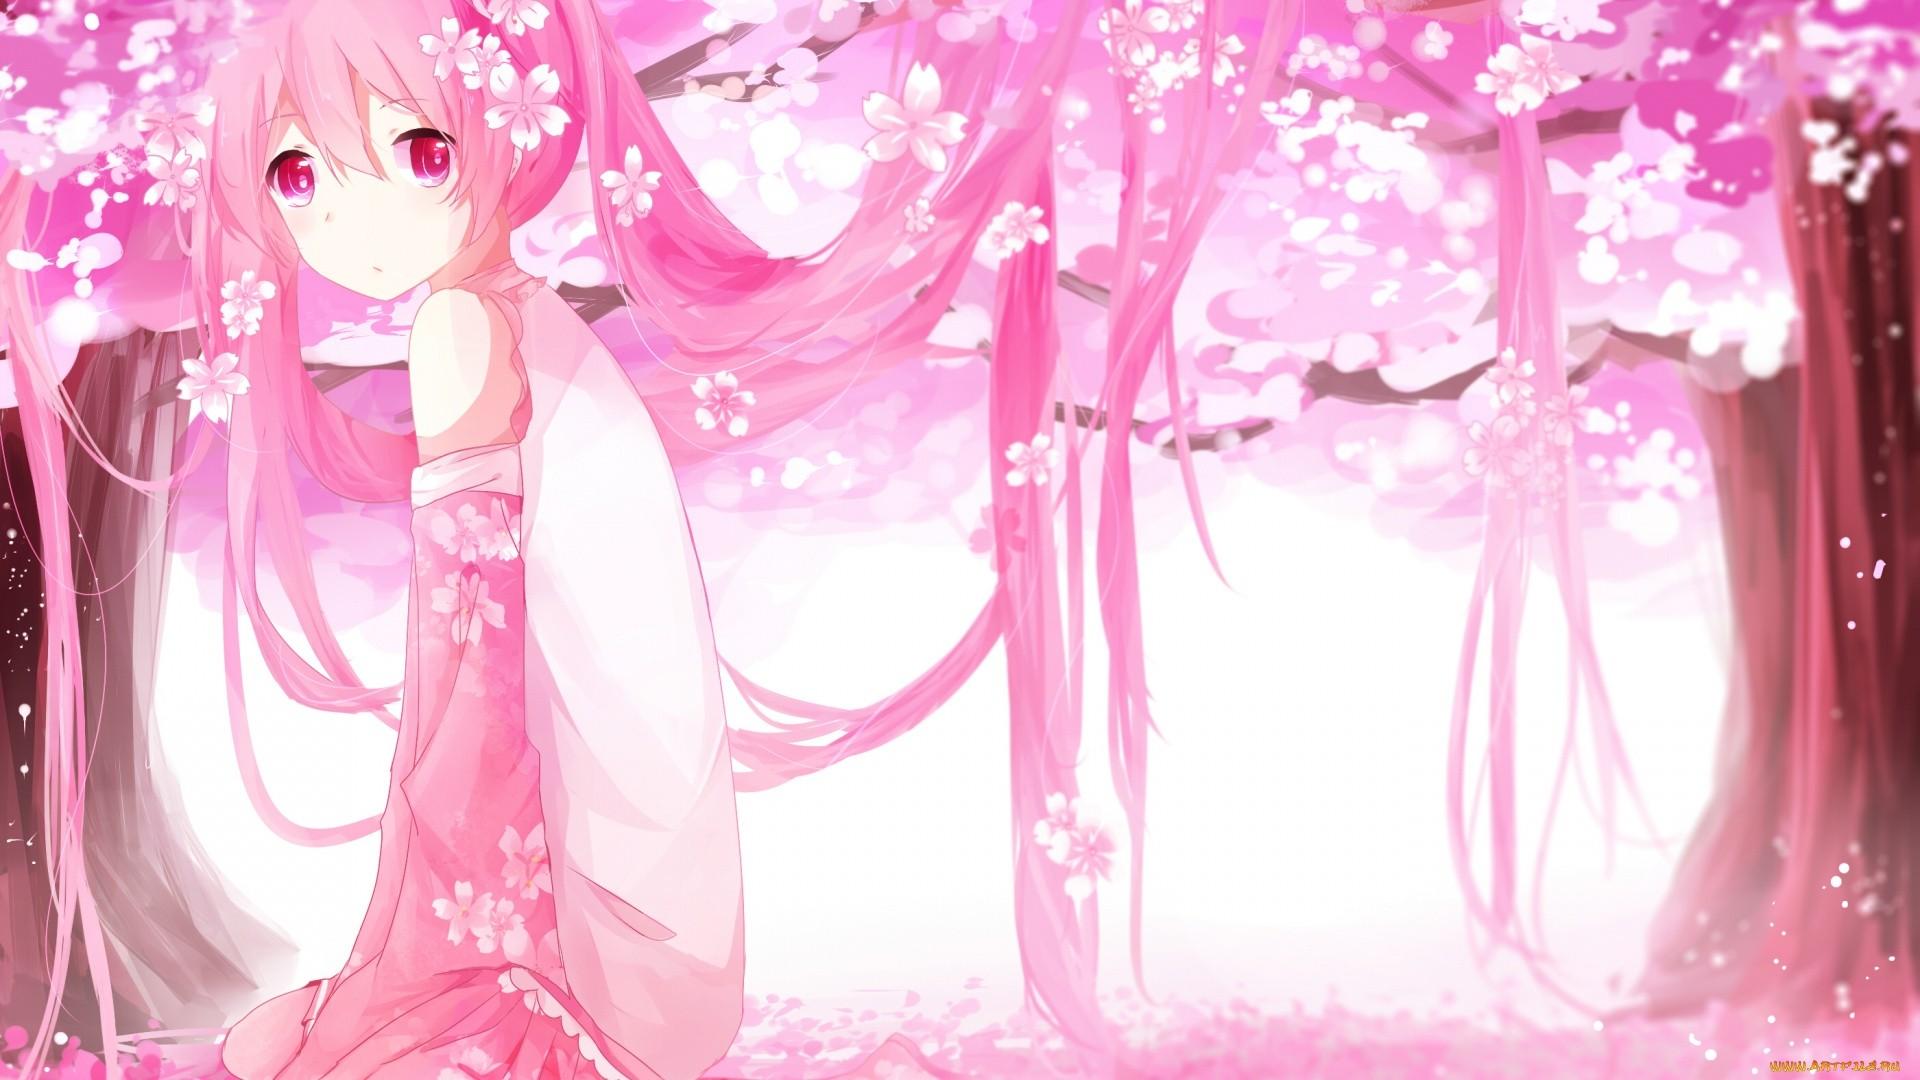 Pink Hair Anime Girl wallpaper photo hd